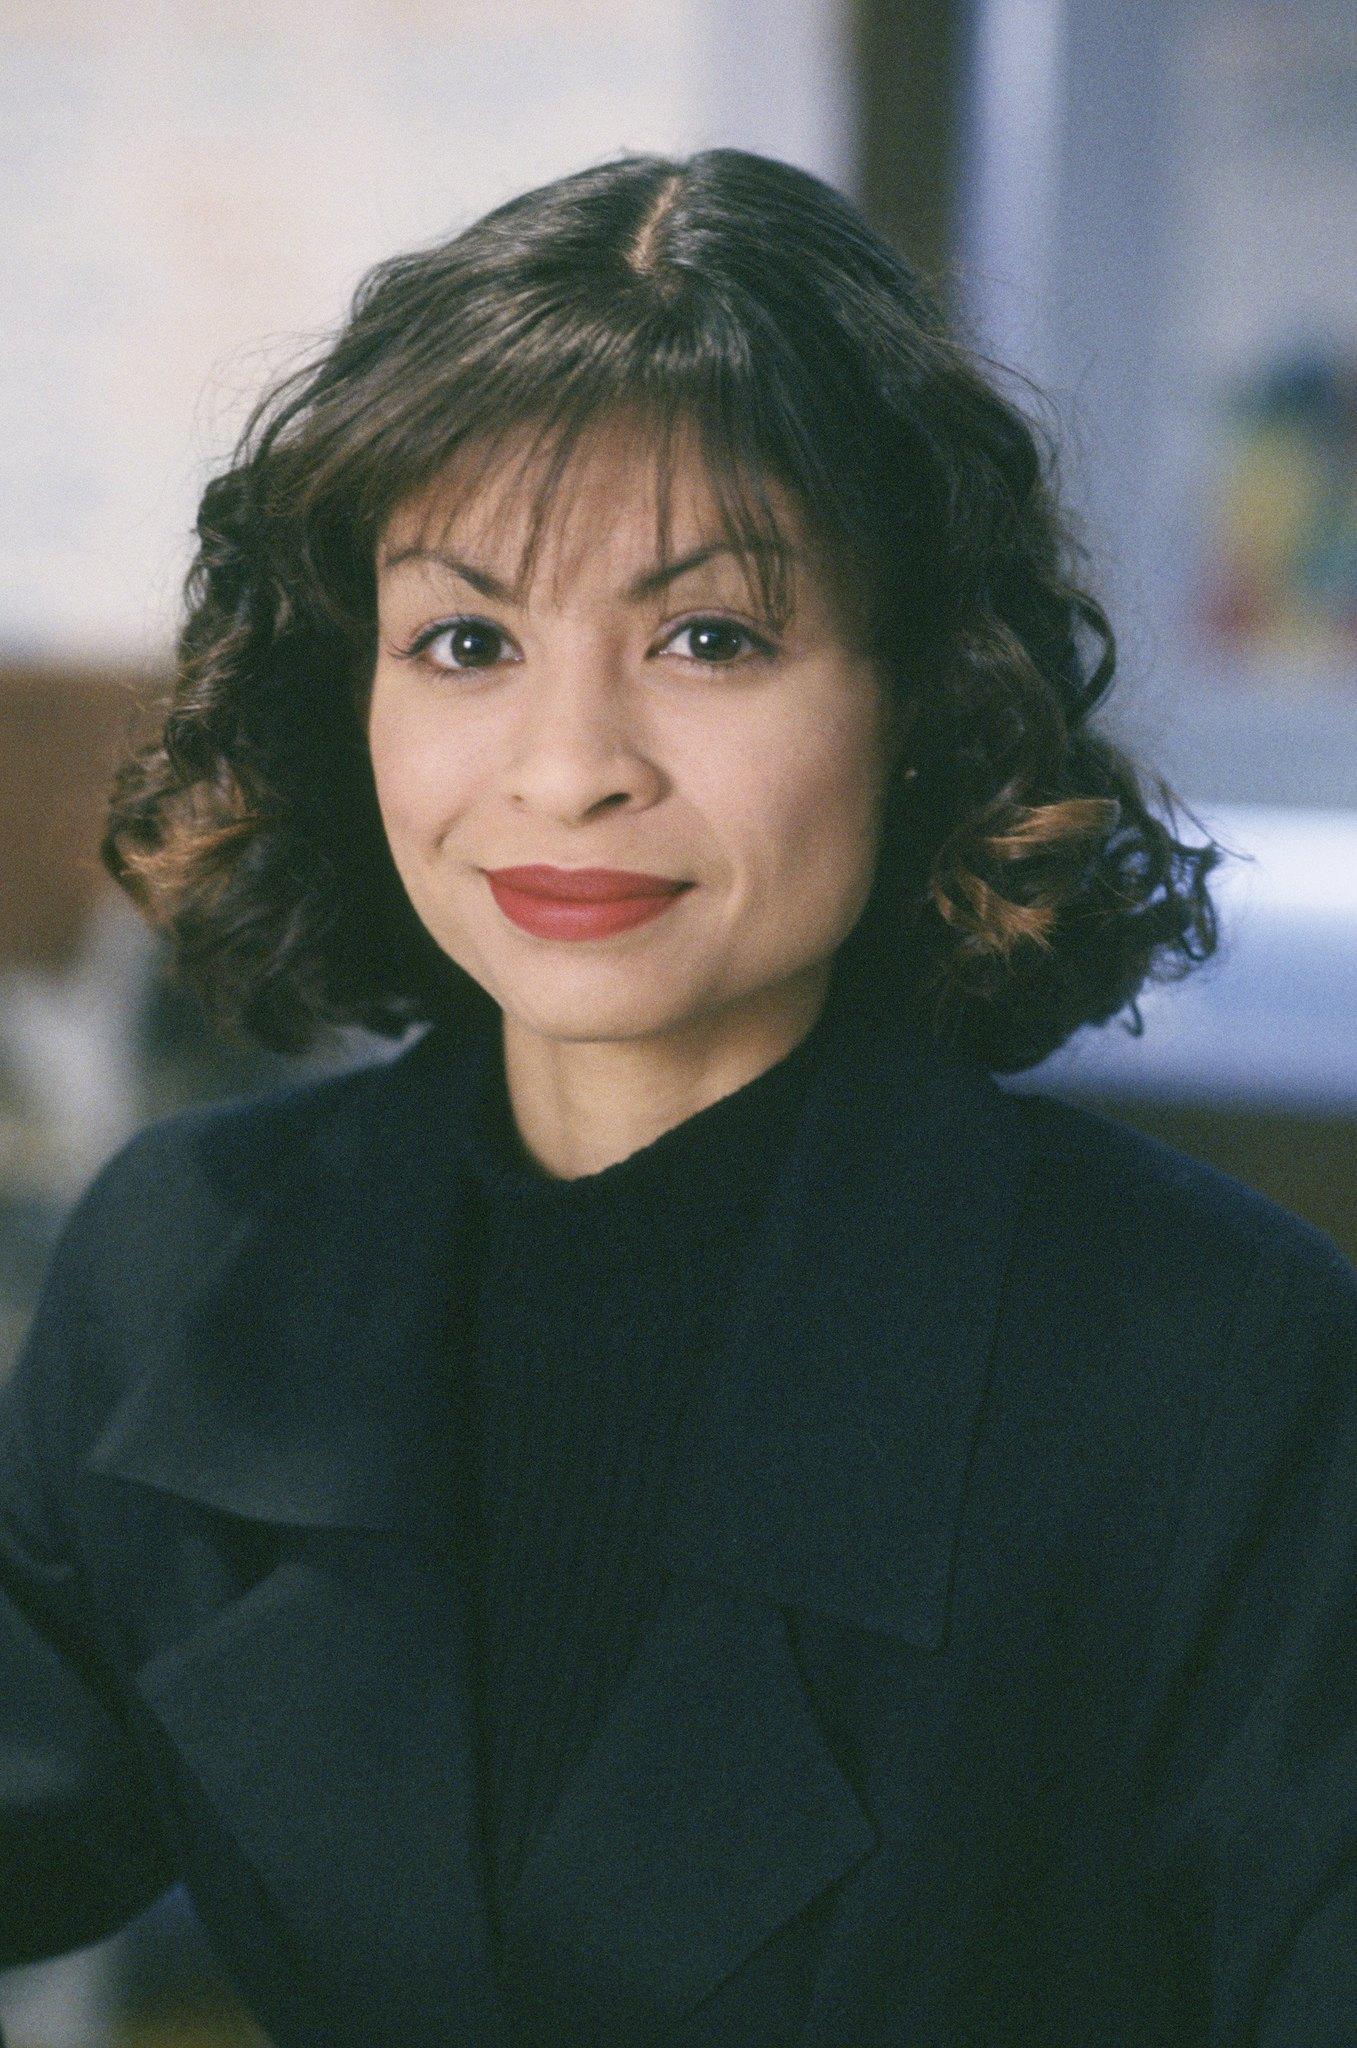 Vanessa Marquez - Contact Info, Agent, Manager  Imdbpro-2712